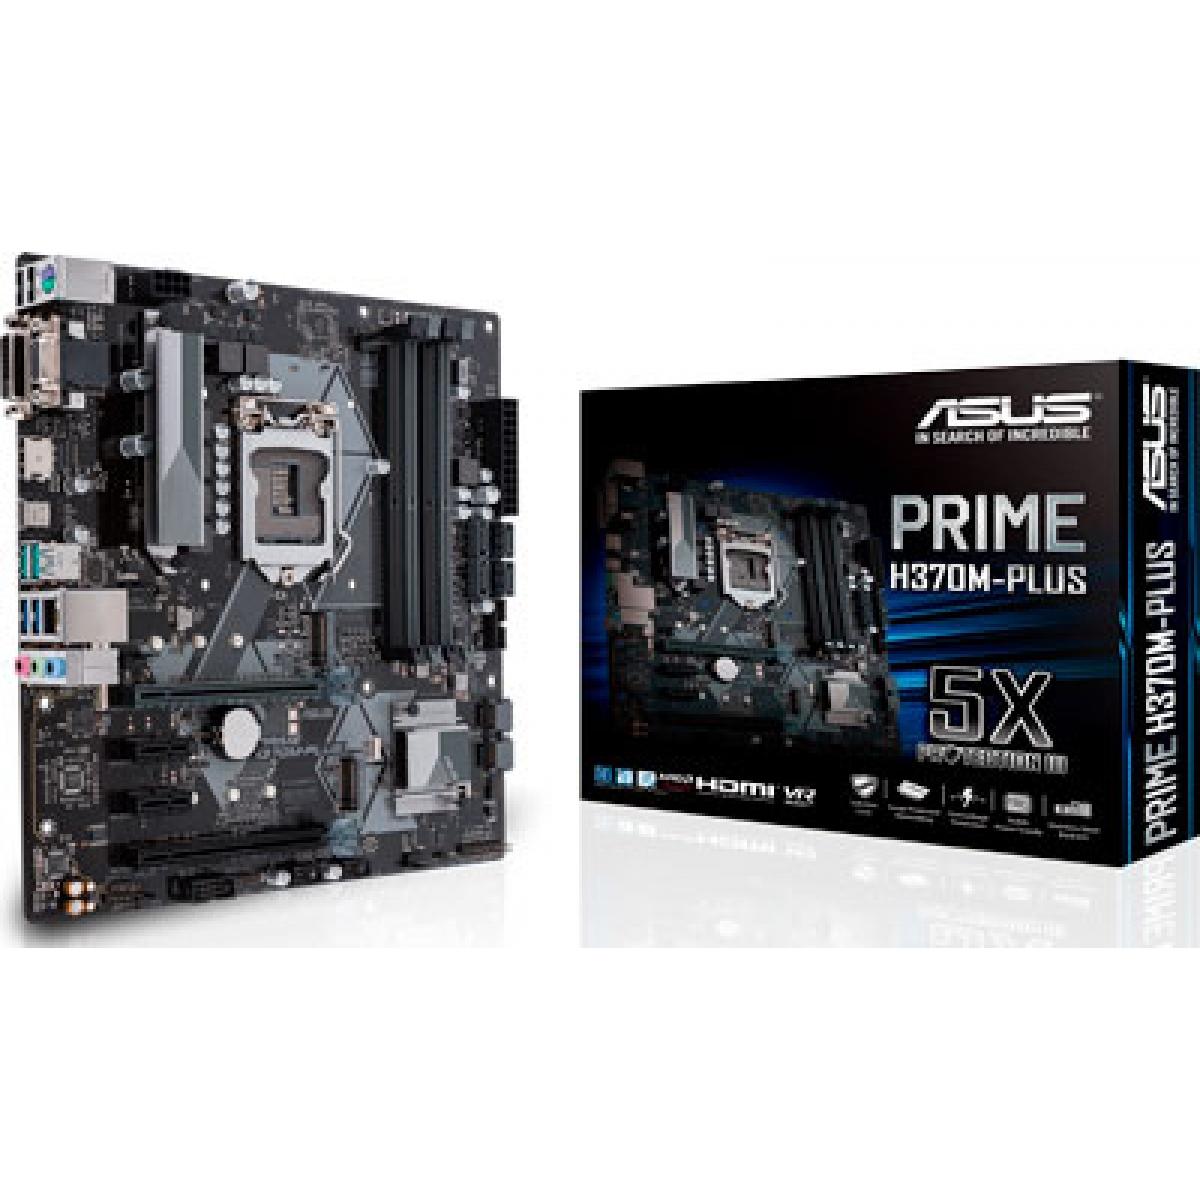 Placa Mãe Asus Prime H370M-PLUS, Chipset H370, Intel LGA 1151, mATX, DDR4